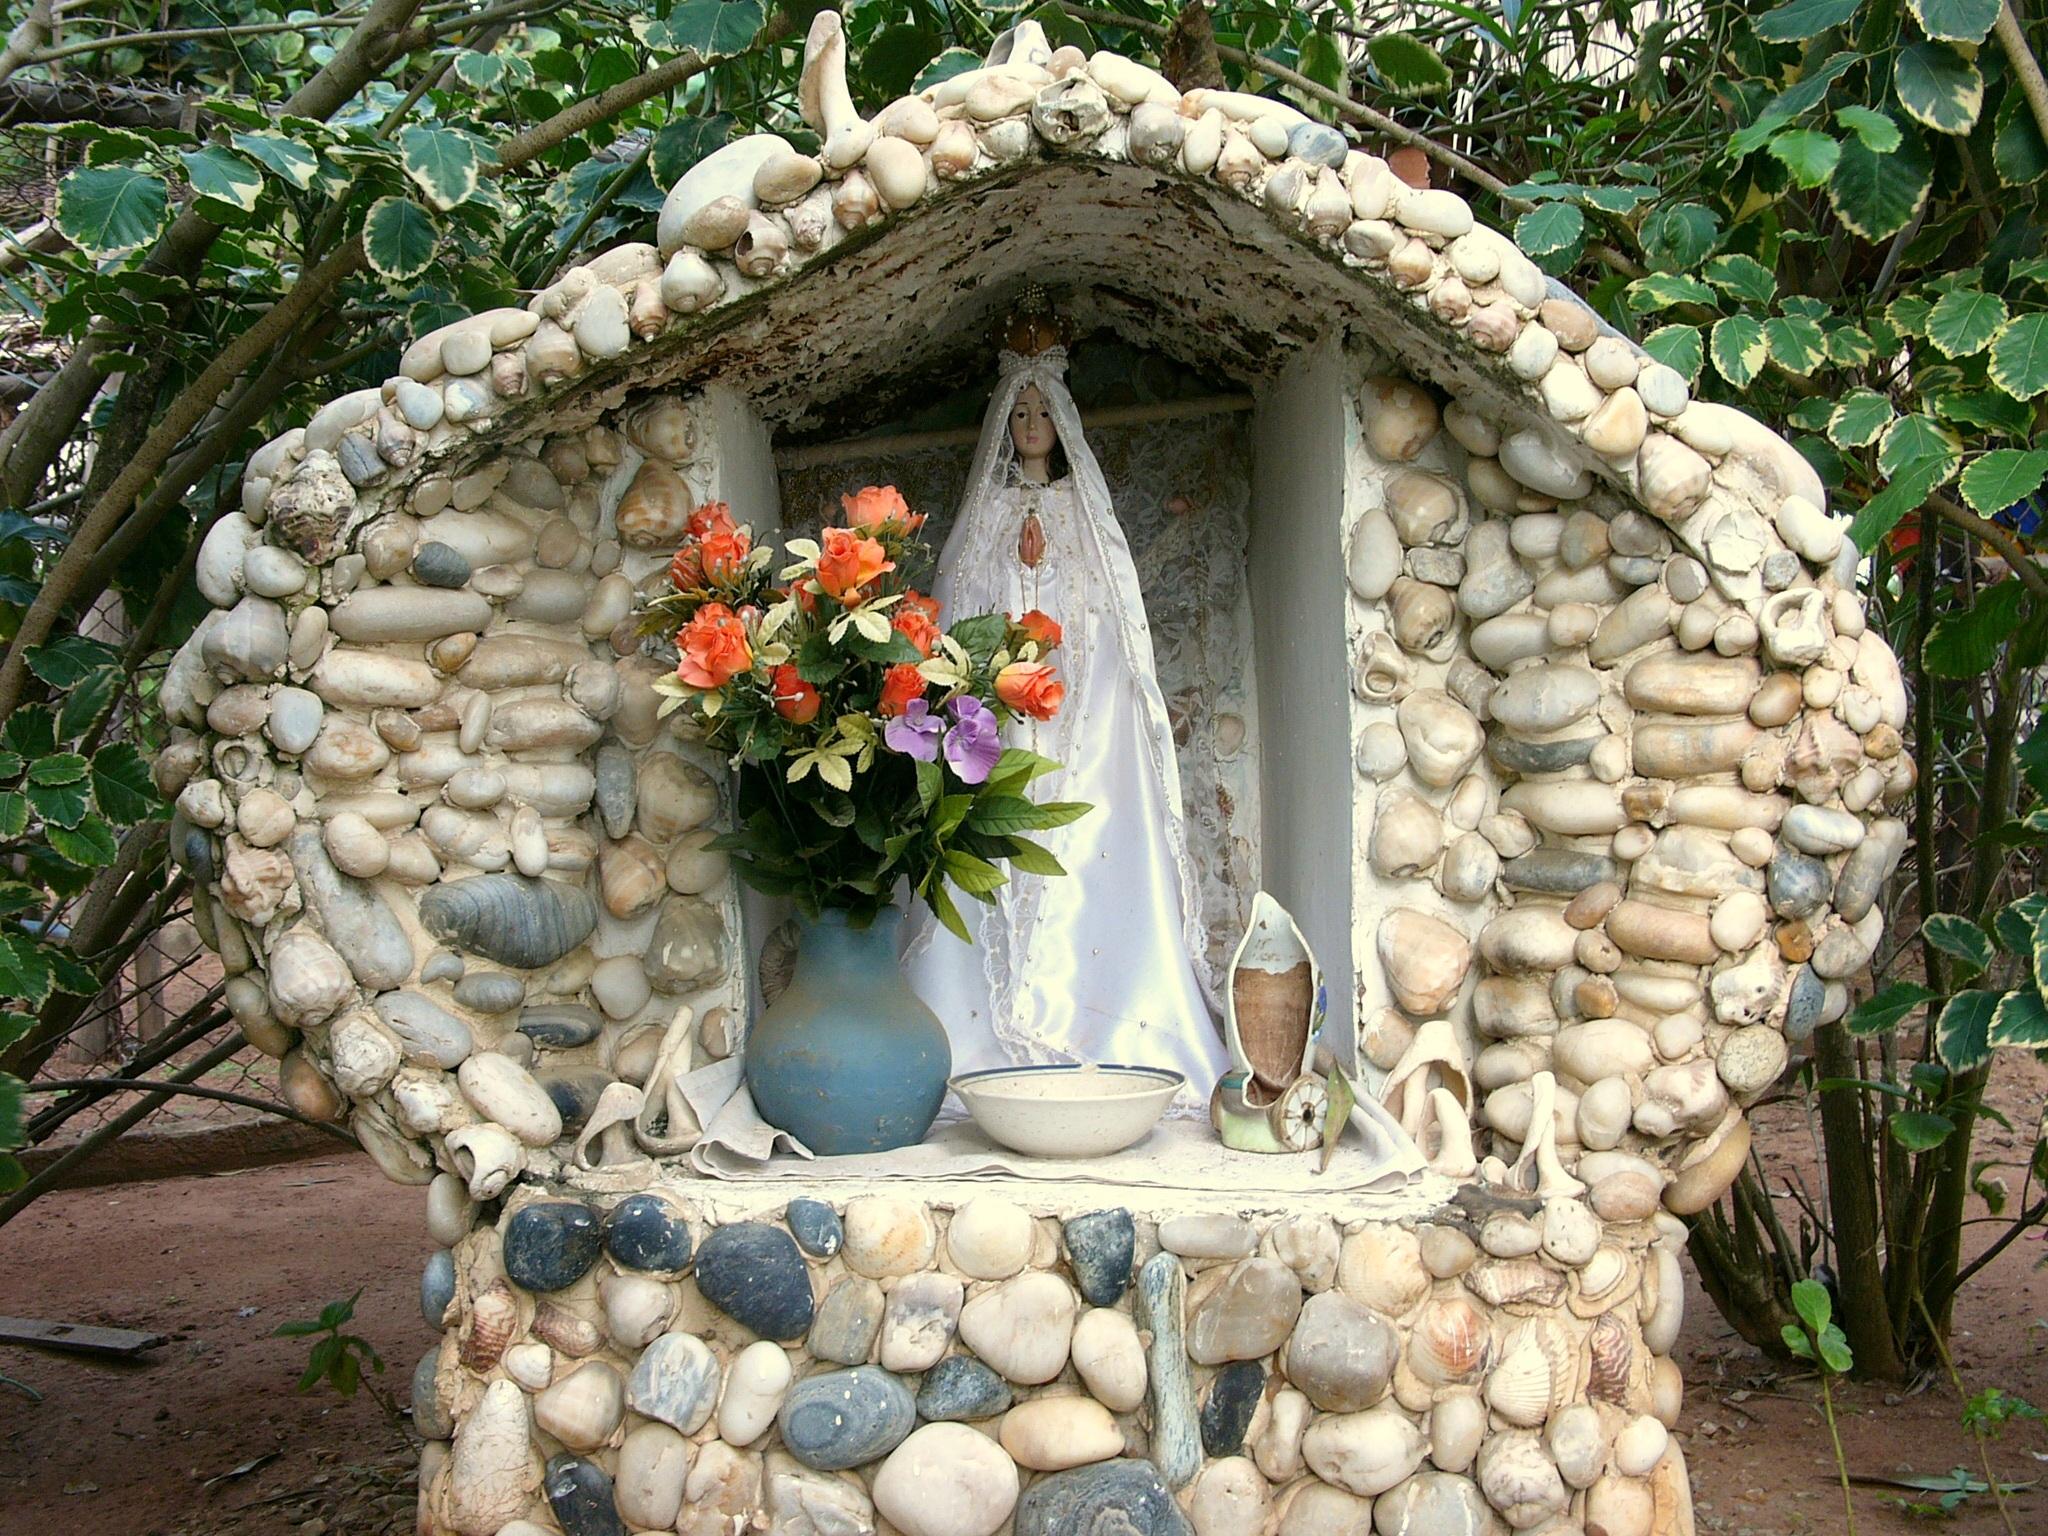 Fotos gratis flor piedra florero jard n flores - Decoracion navidena jardin ...